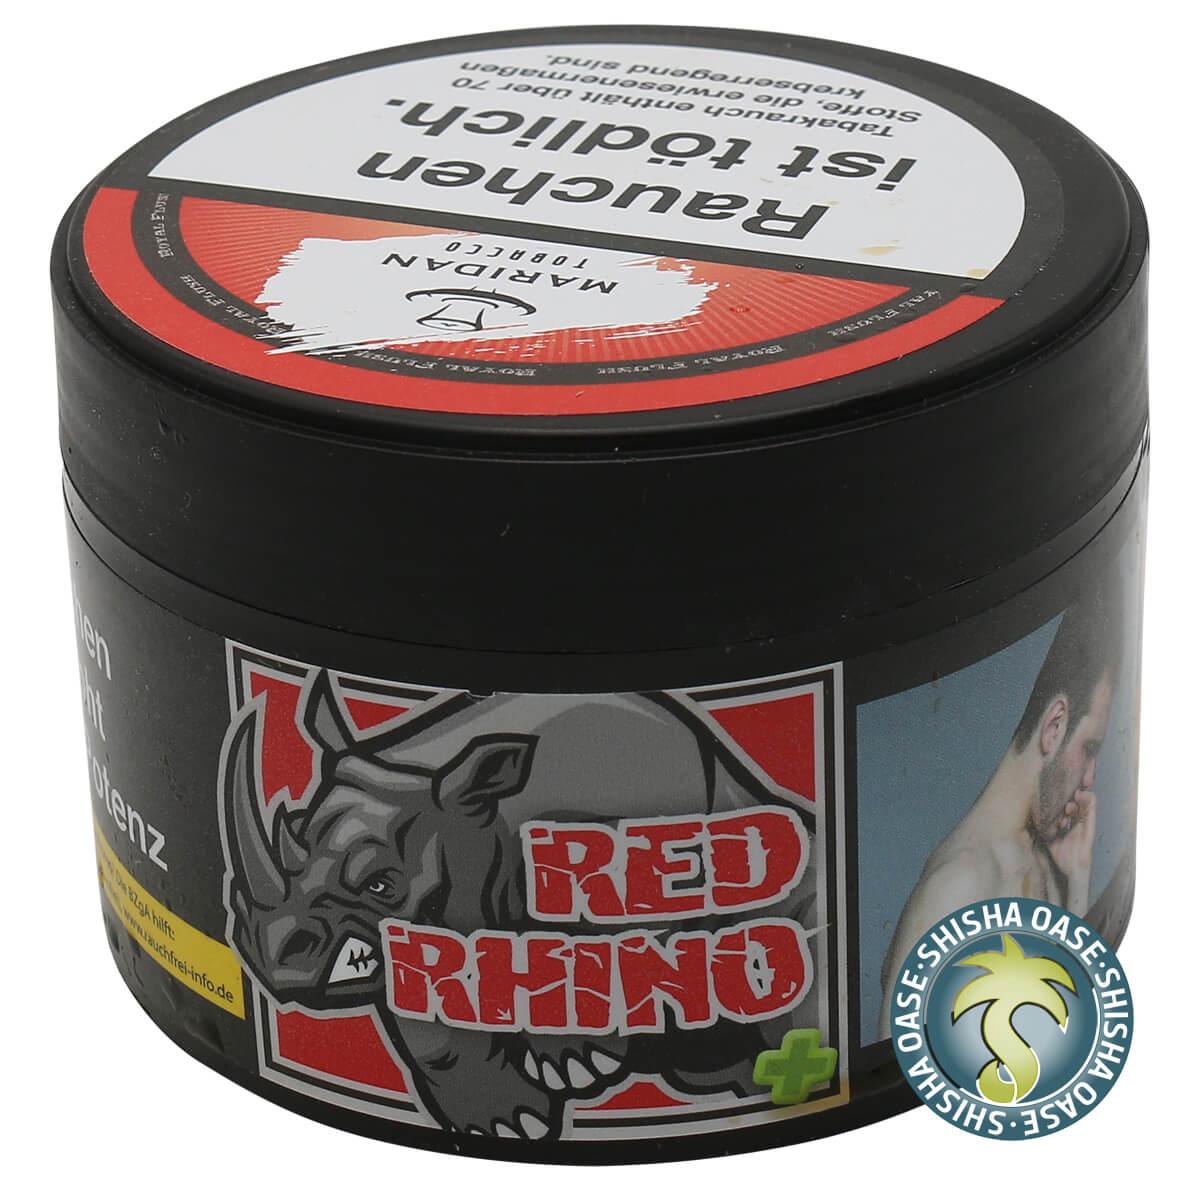 Maridan Tabak 200g Dose - Red Rhino